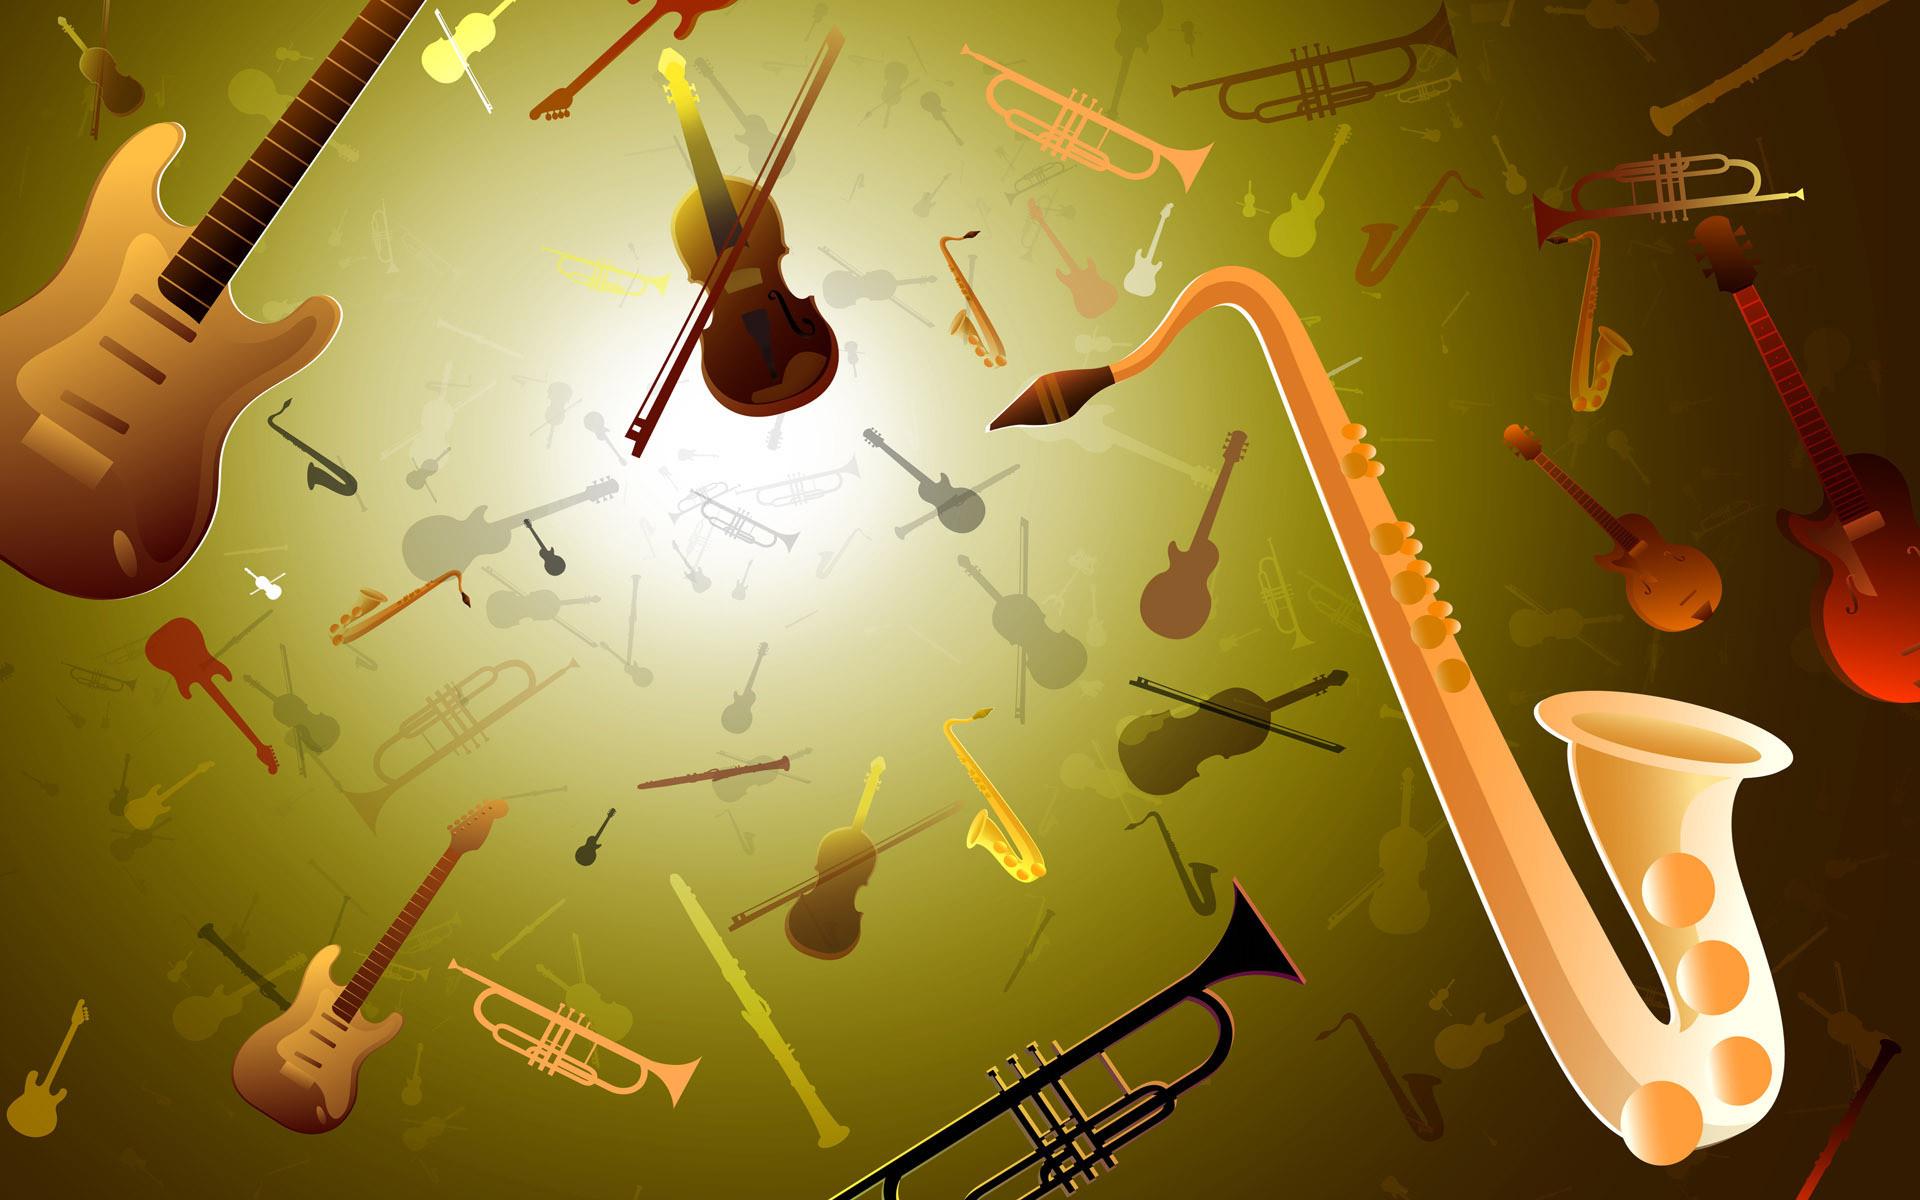 Music Instrument Wallpaper (69+ Images